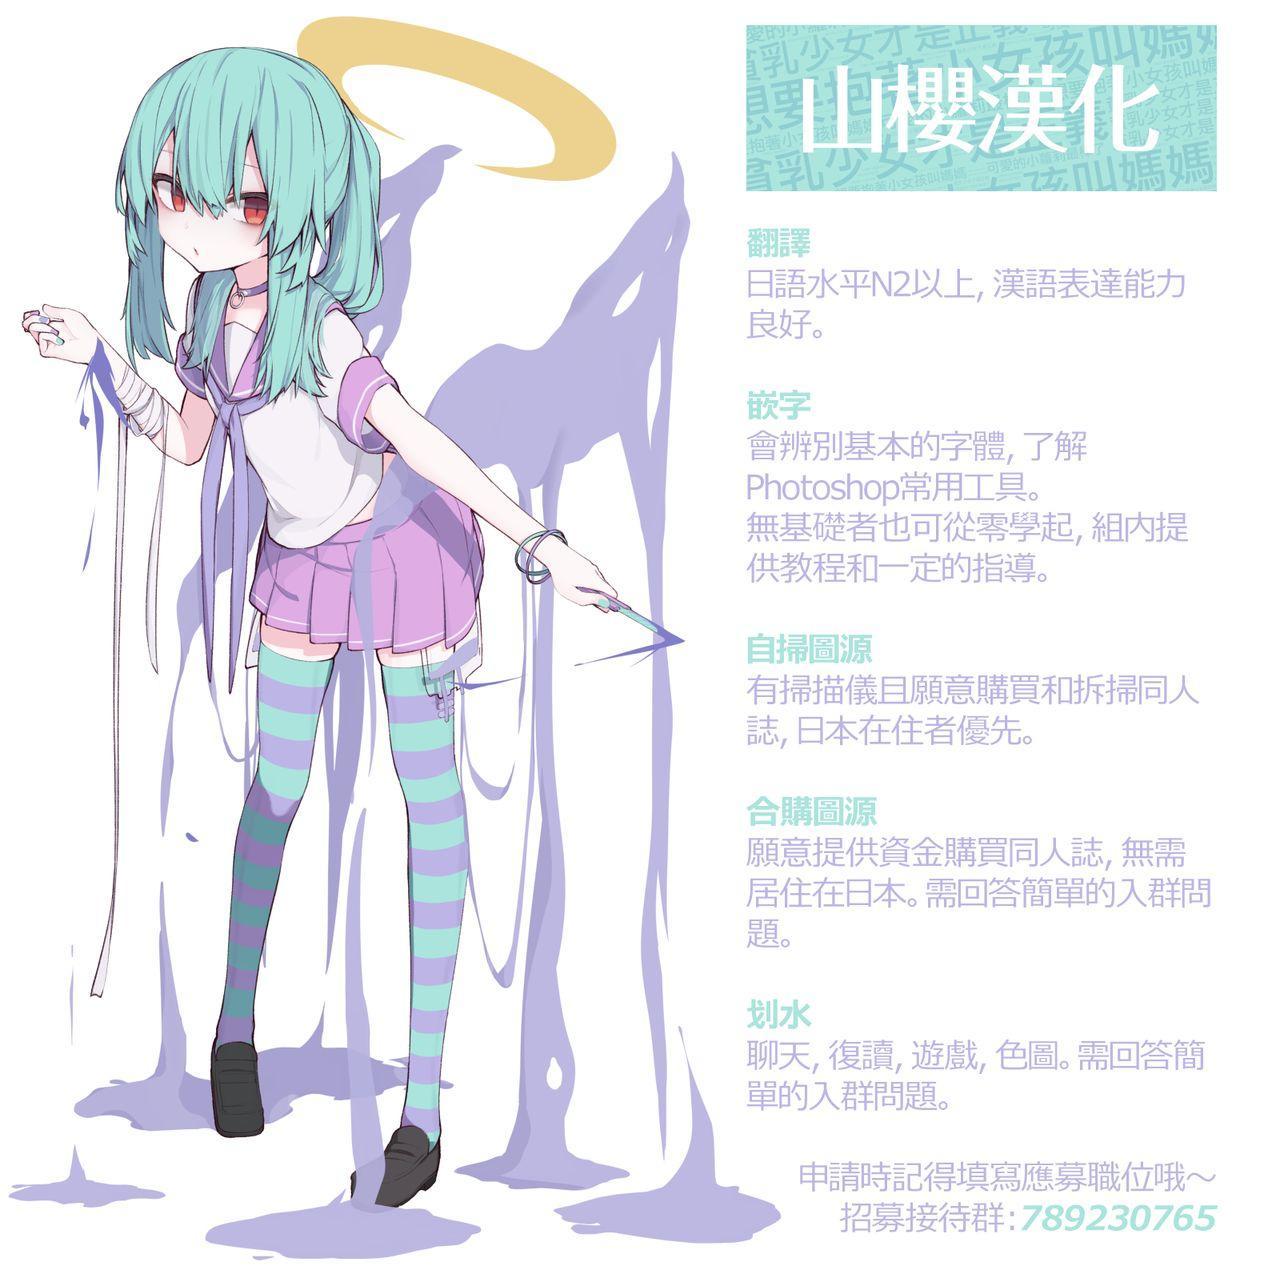 Boku wa Chiisana Succubus no Shimobe - I am a slave of a small succubus 198